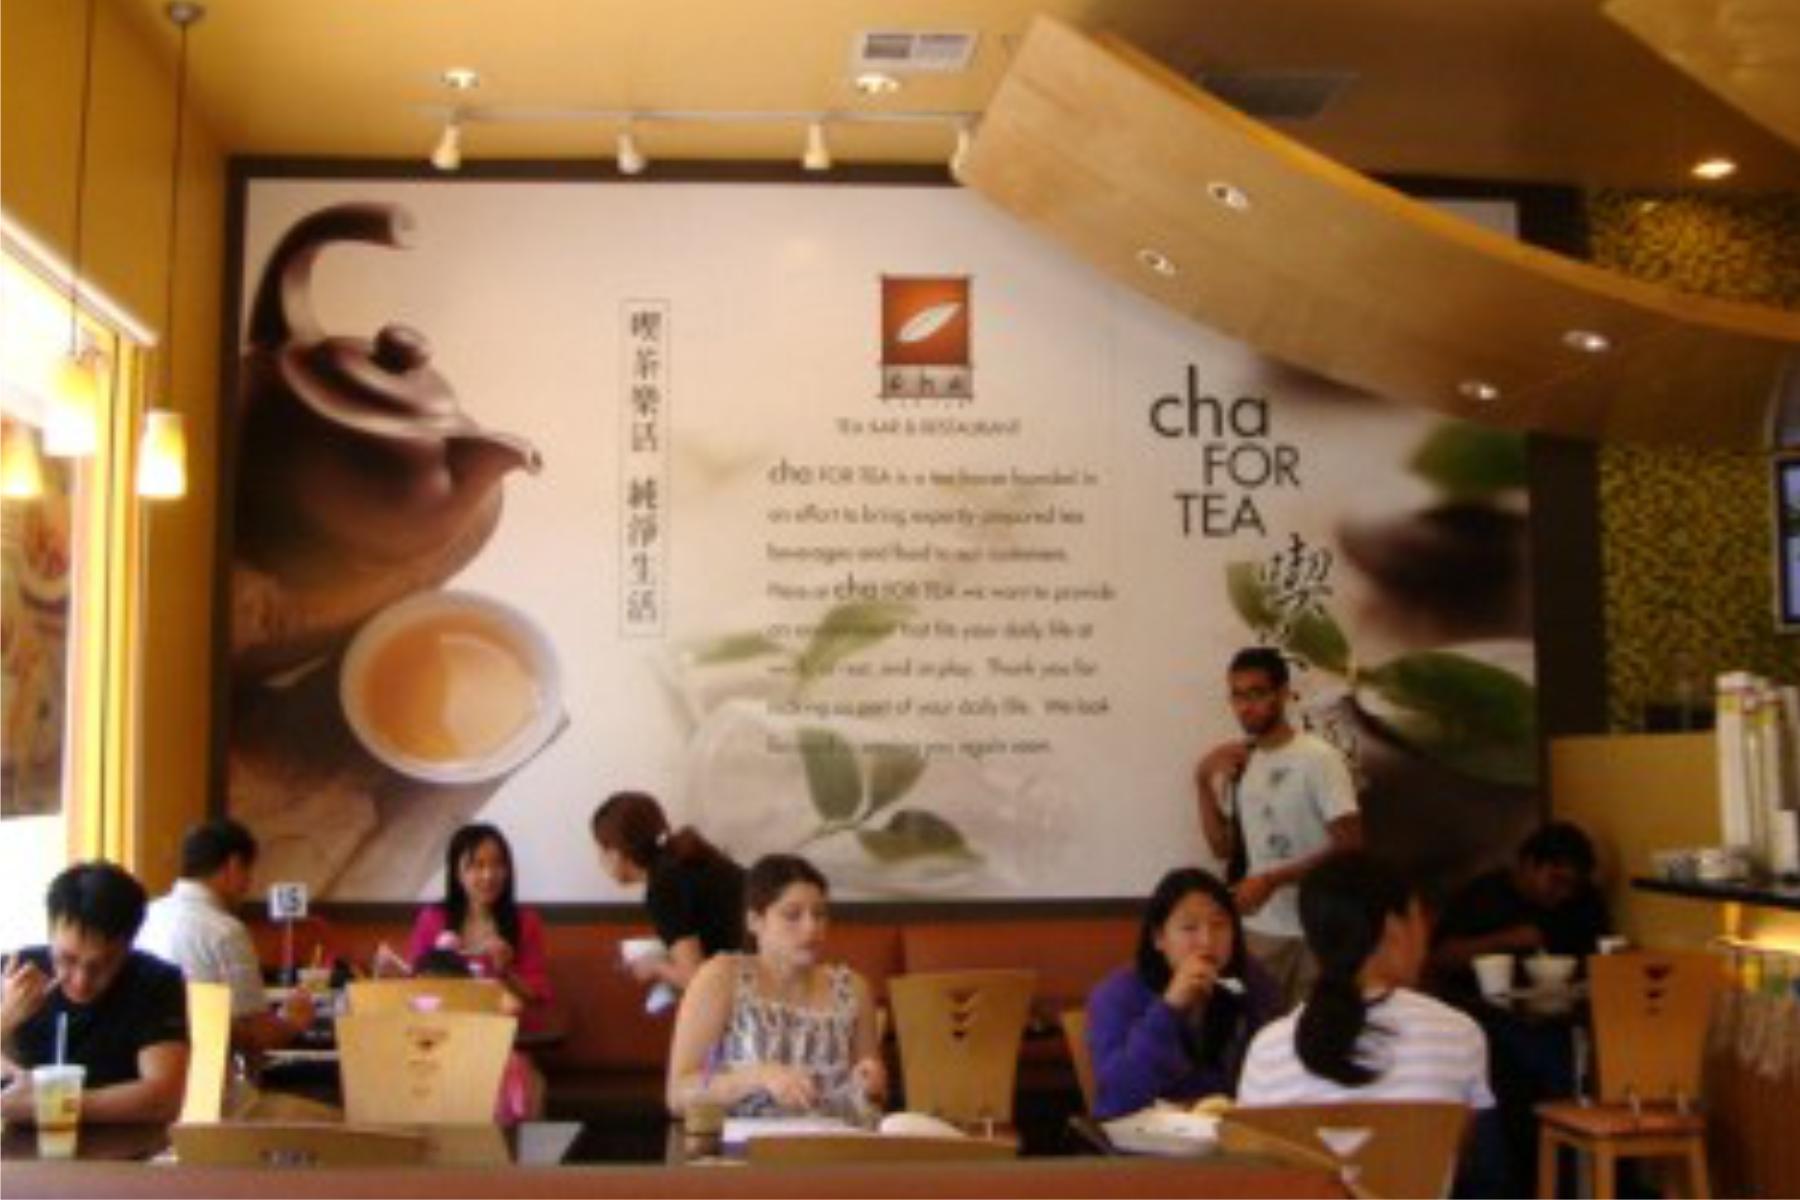 Cha for Tea